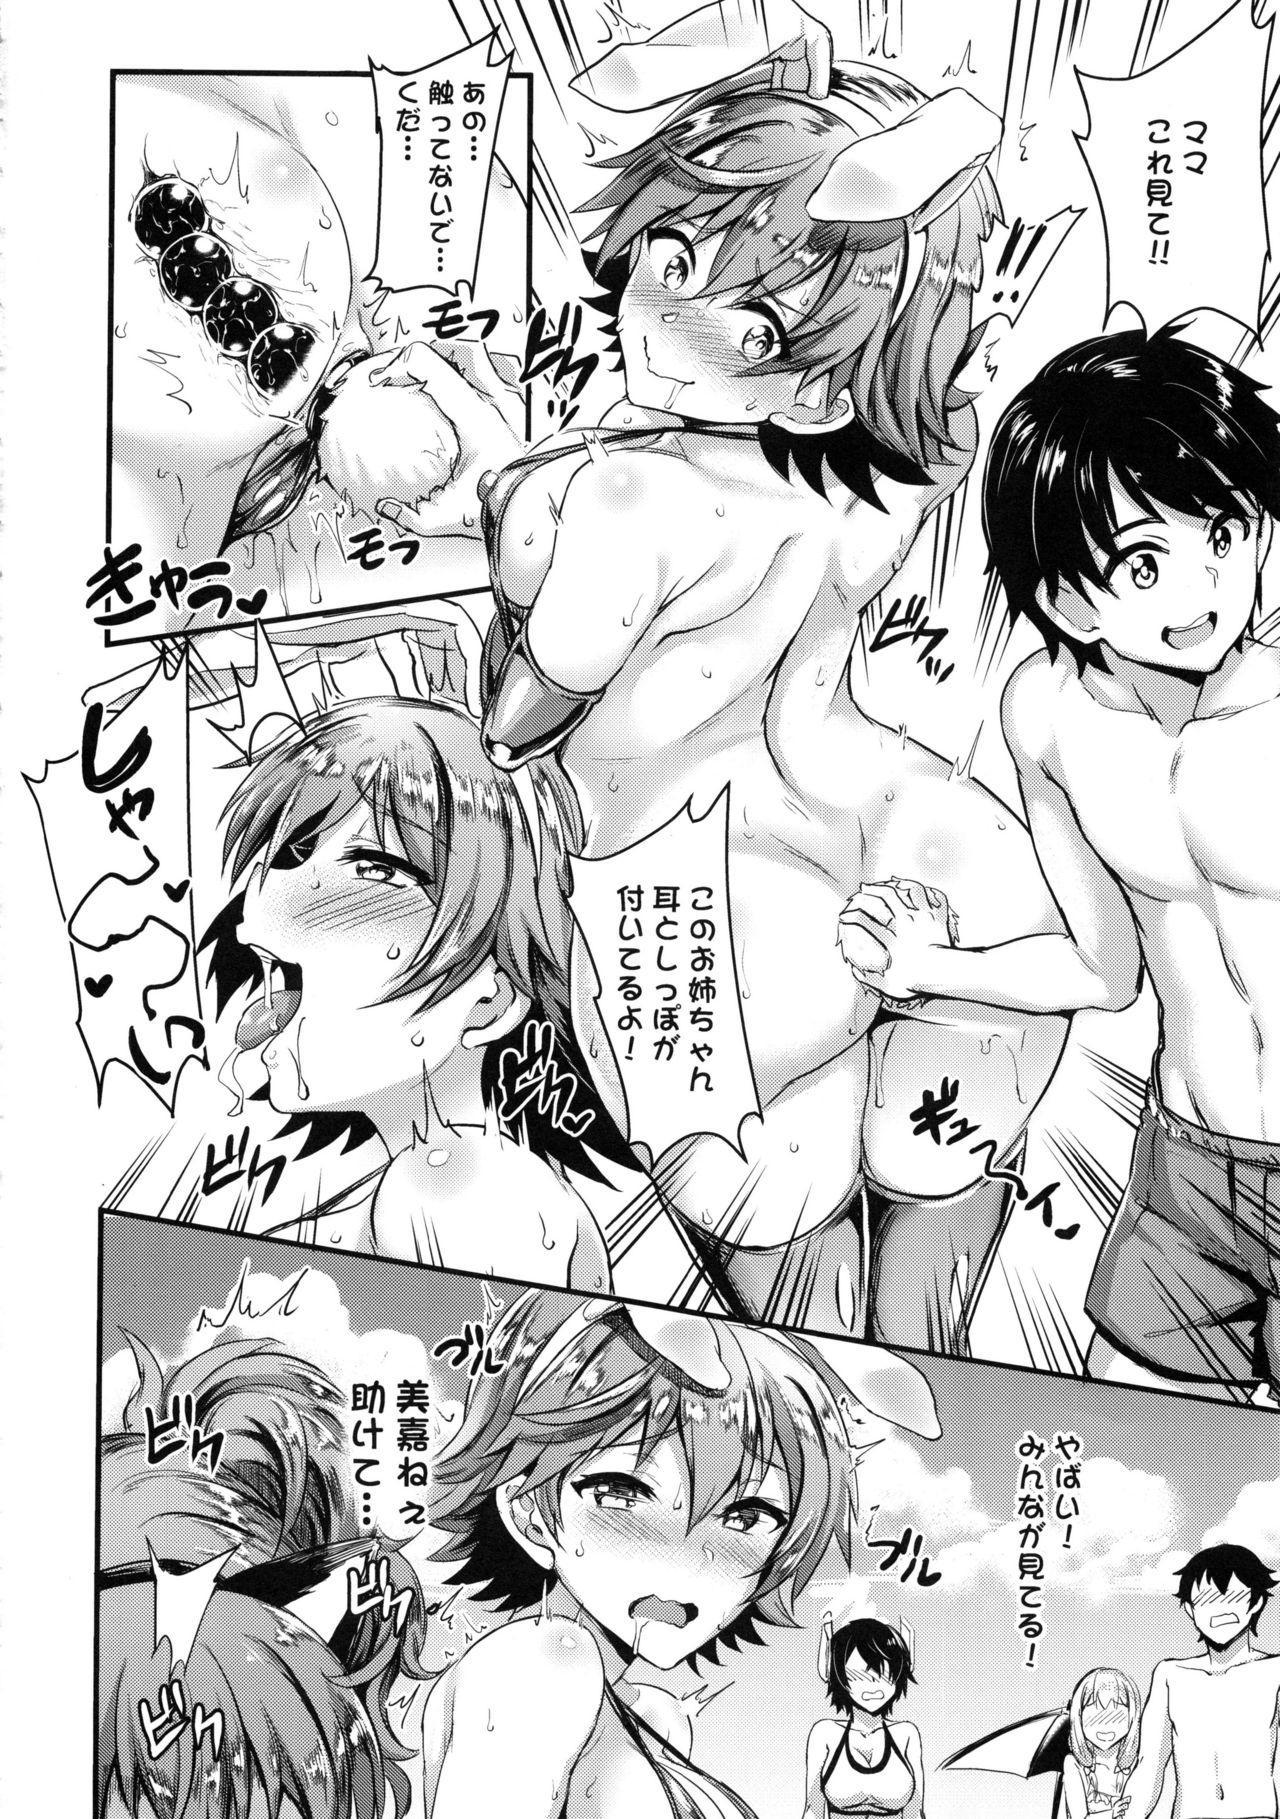 (C92) [BRIO (Puyocha)] Mika-nee no Tanryoku Shidou - Mika's Guide to Self-Confidence (THE IDOLM@STER CINDERELLA GIRLS) 10